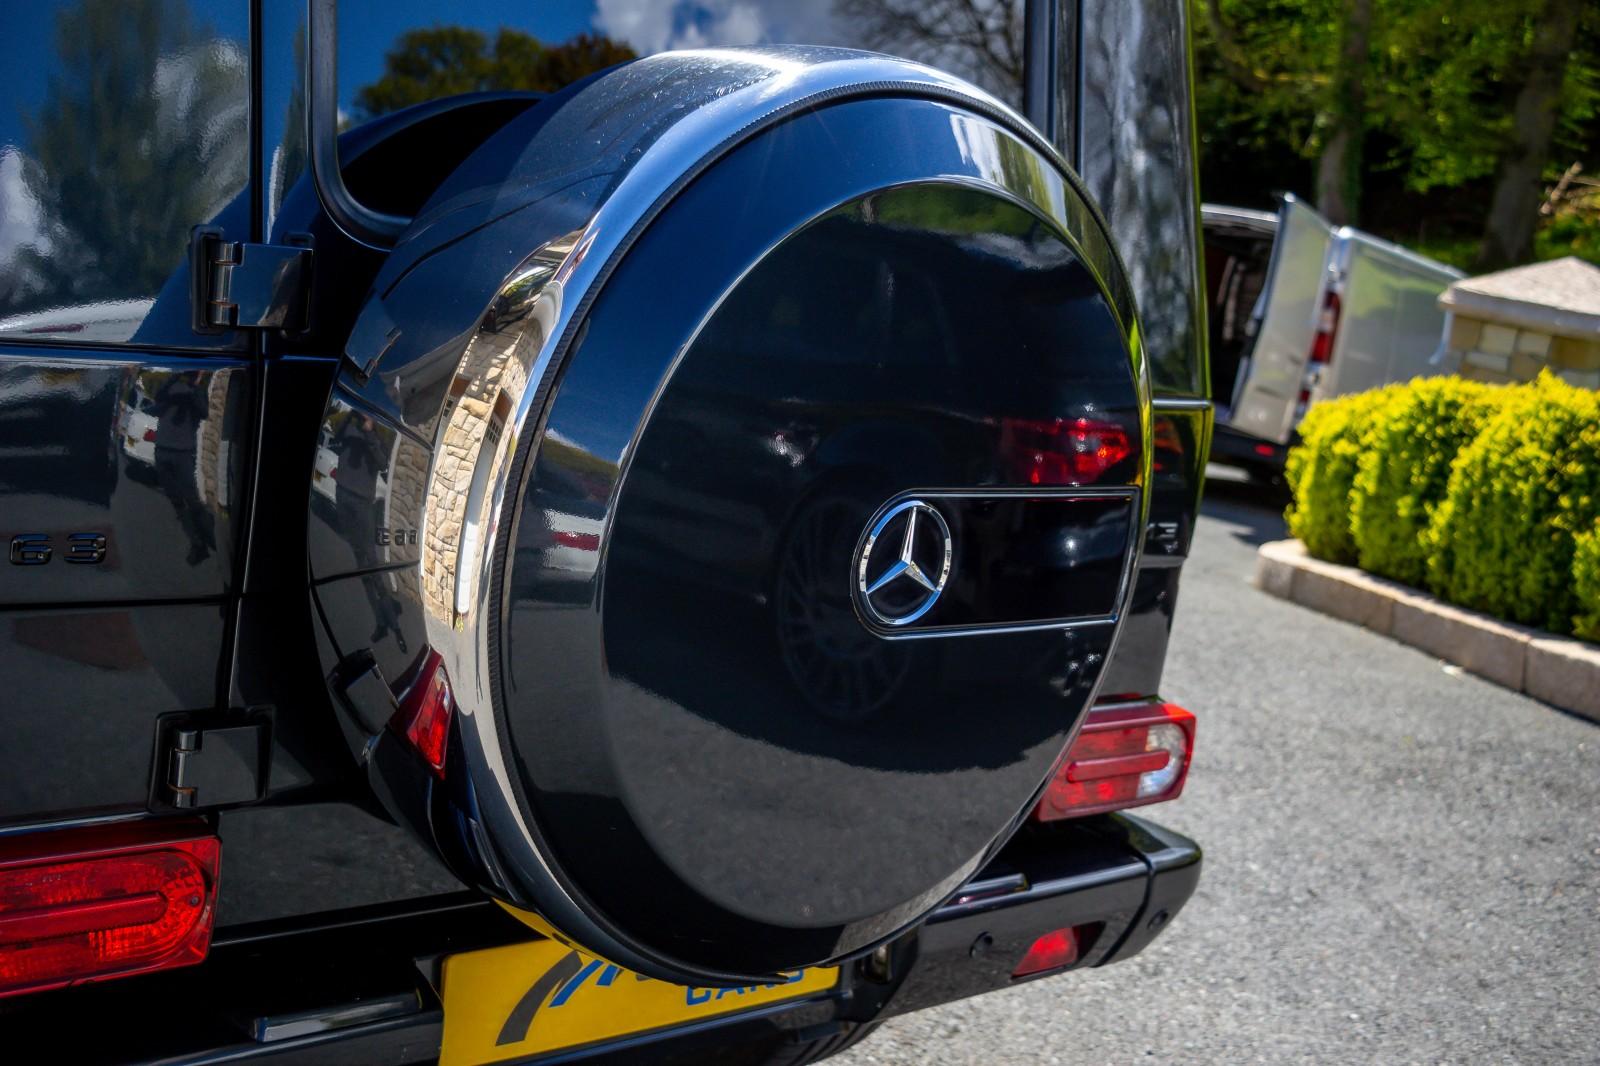 2013 Mercedes-Benz G Class G63 AMG Petrol Automatic – Morgan Cars 9 Mound Road, Warrenpoint, Newry BT34 3LW, UK full